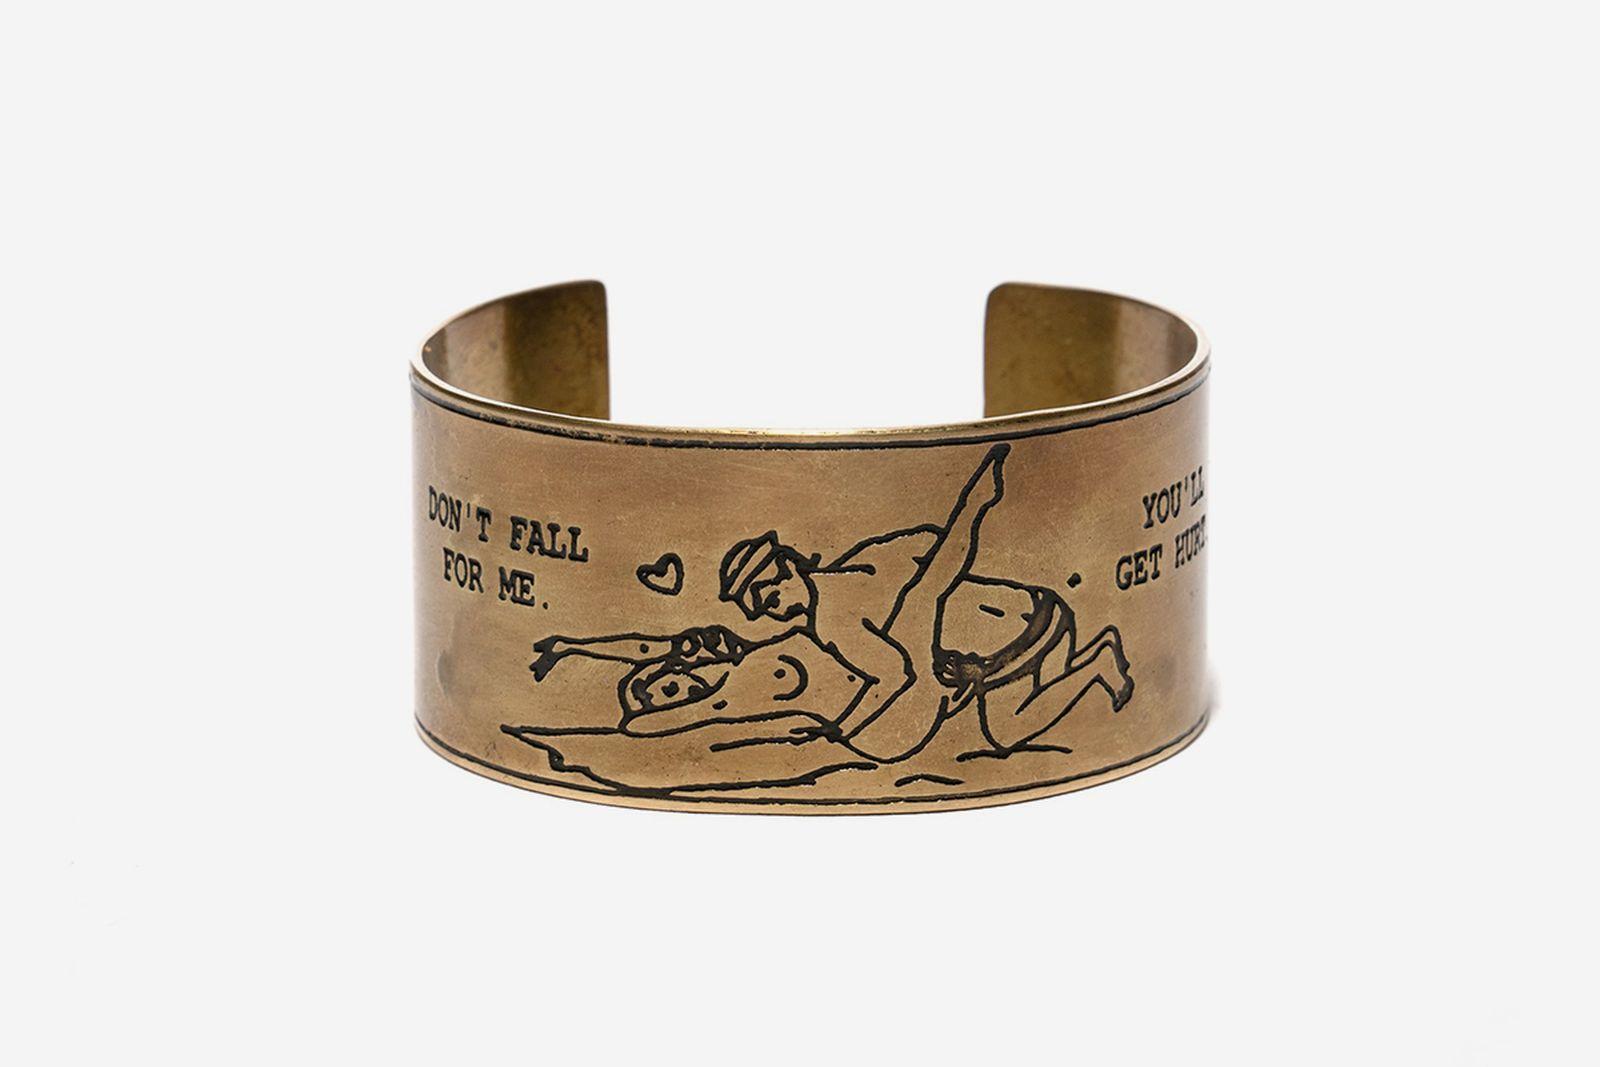 kapital bracelet main haven